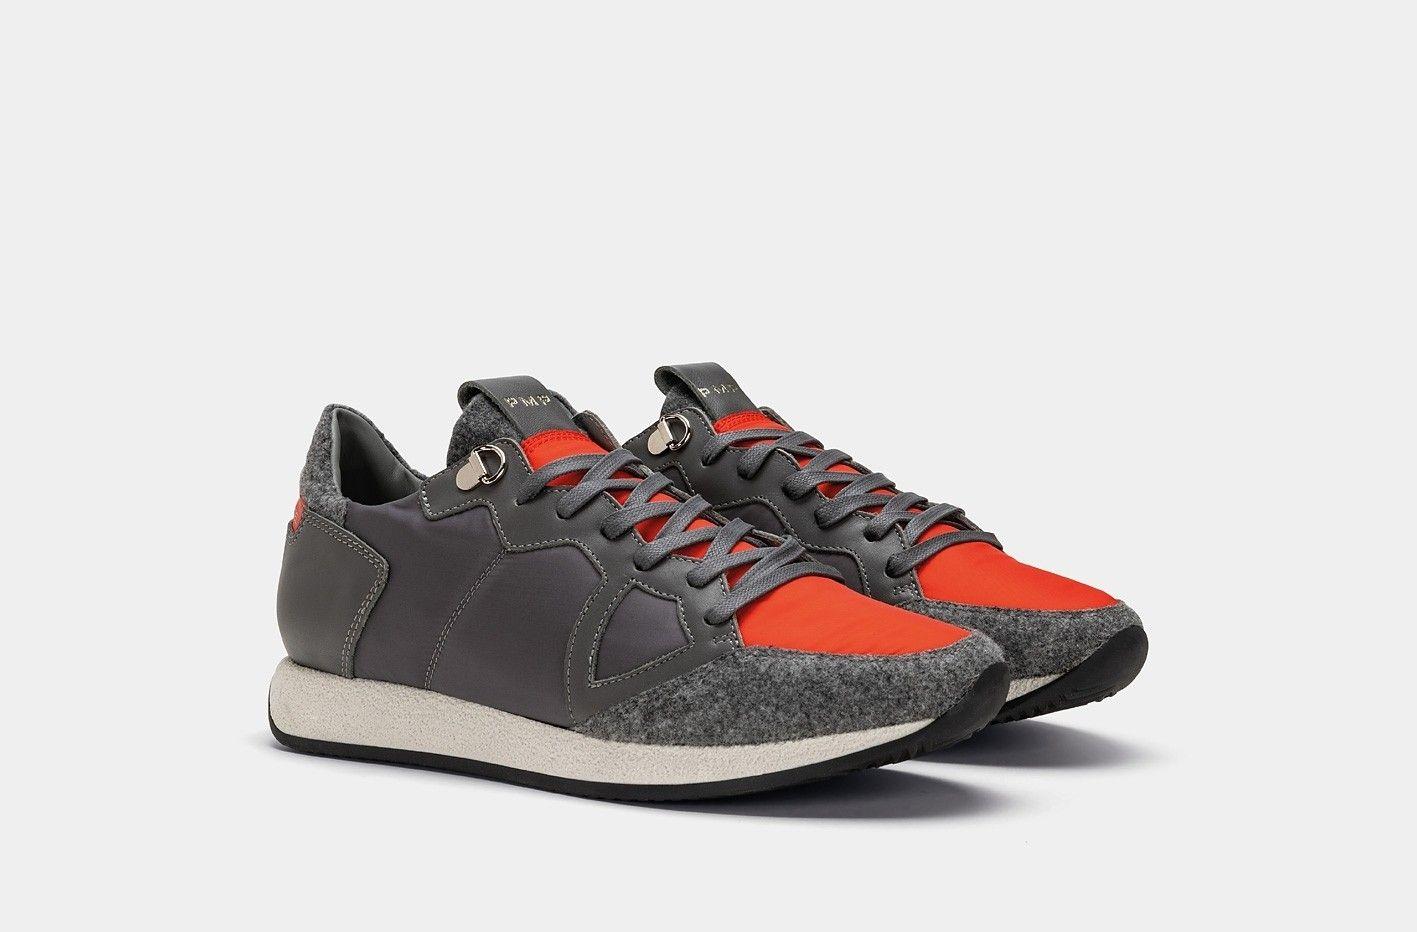 642b704192 -50% PHILIPPE MODEL MONACO TREKKING GRIS ROUGE | Outlet Firme Uomo Sneakers  | Shop Online: Boutique Irene & Mario